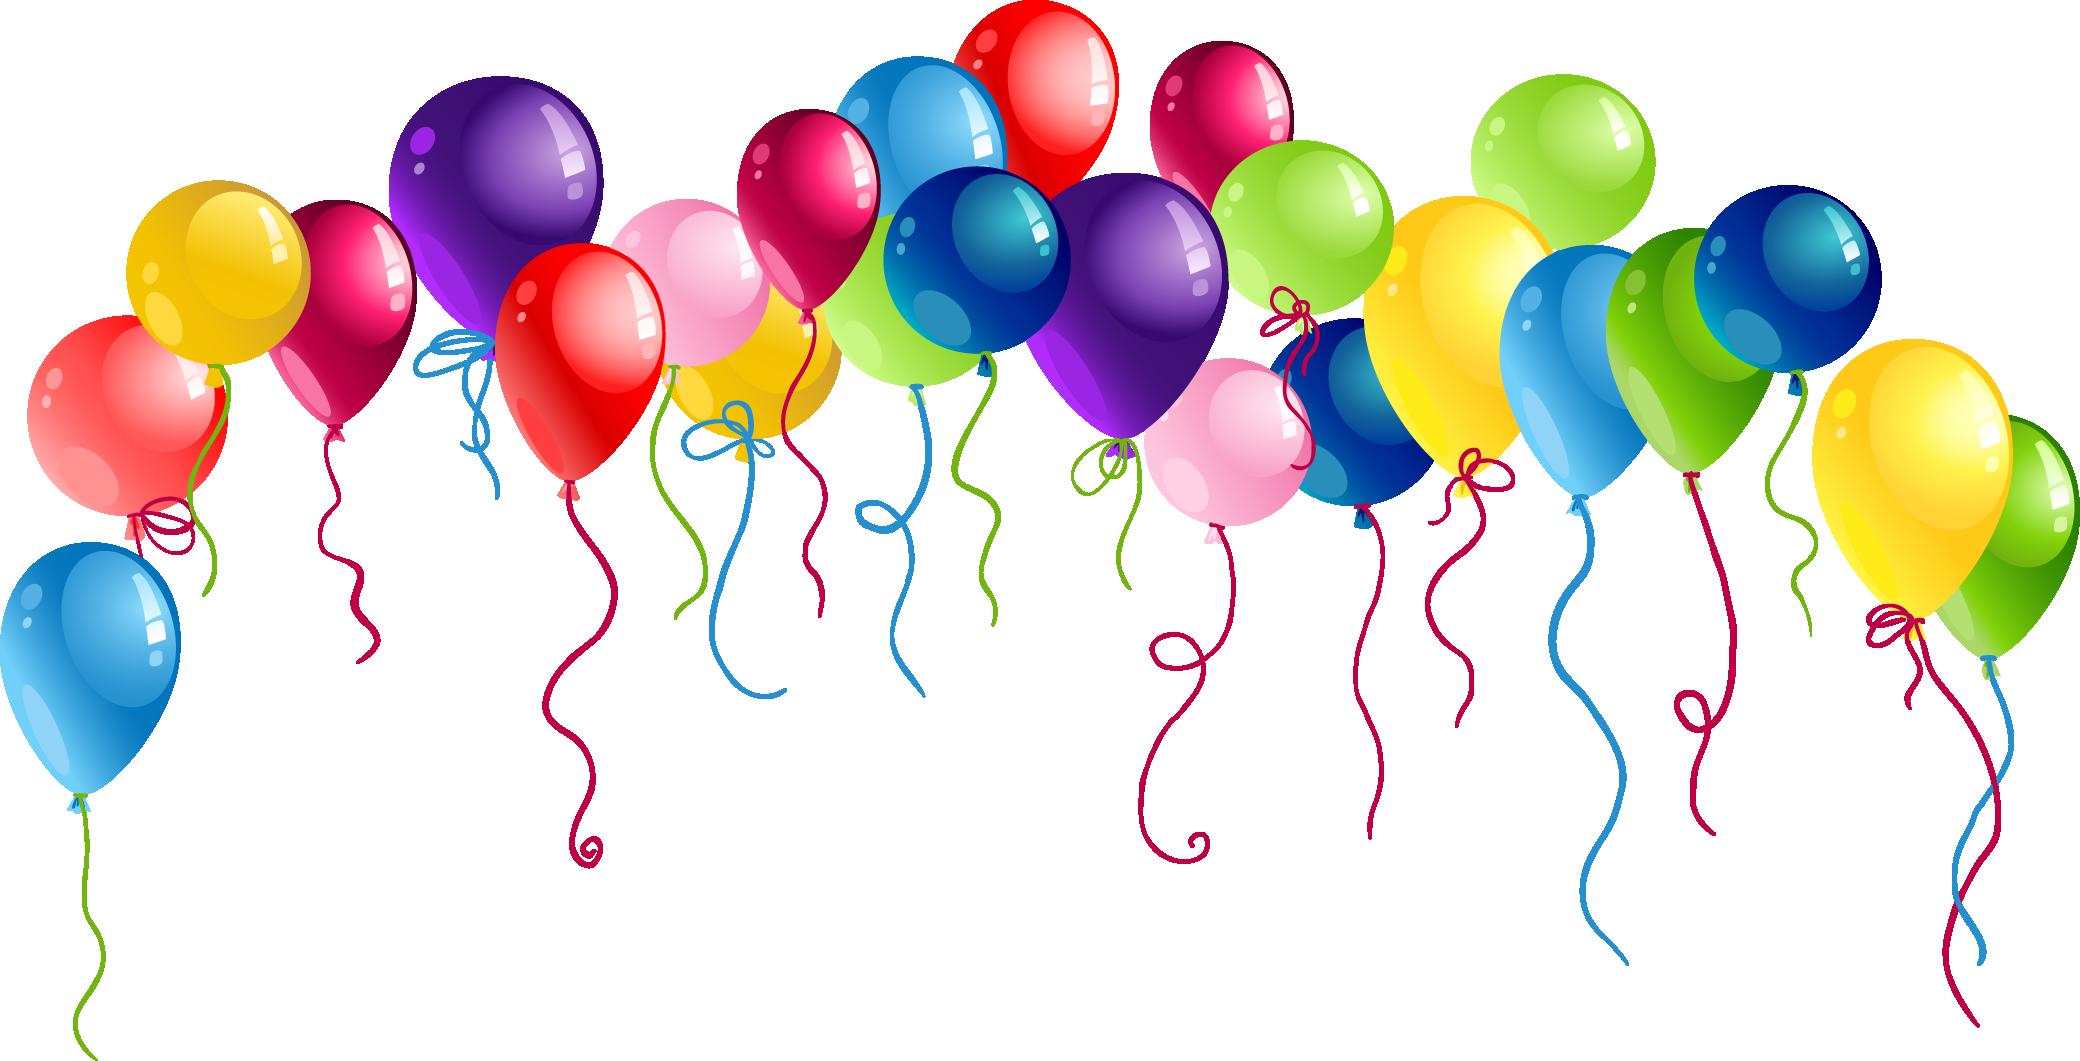 google klipart pinterest. Clipart balloon stall